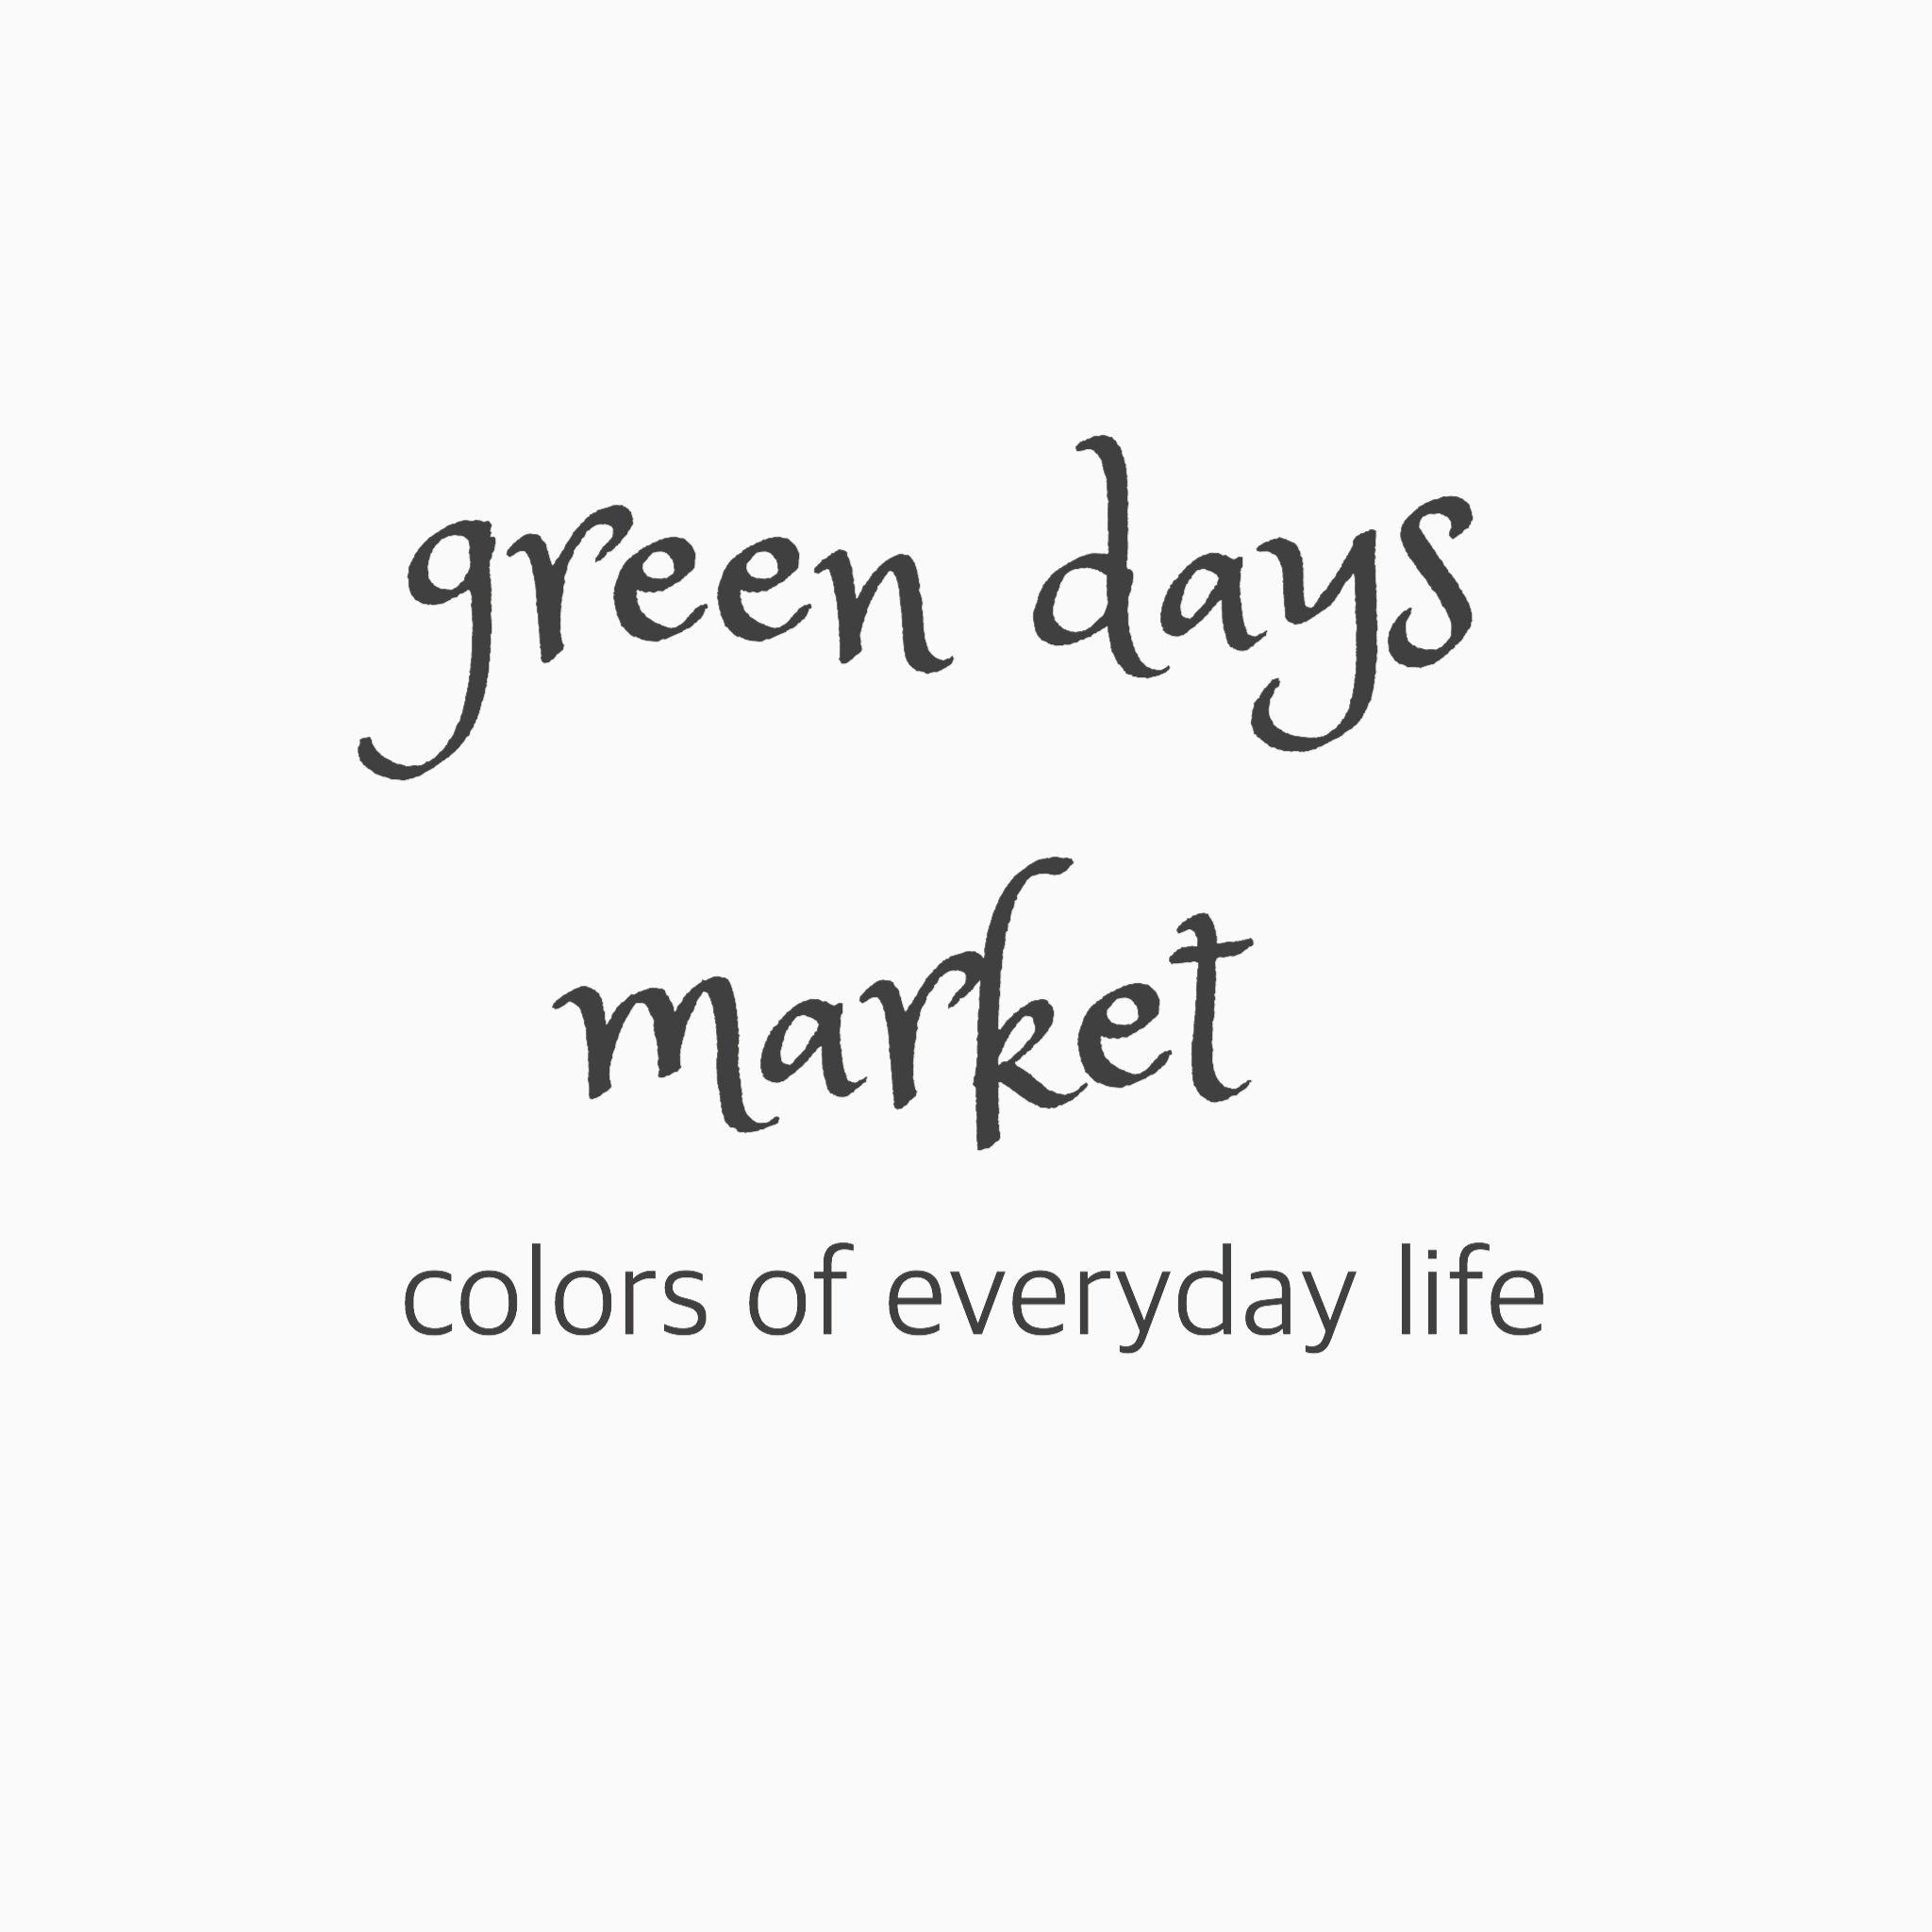 greendays market